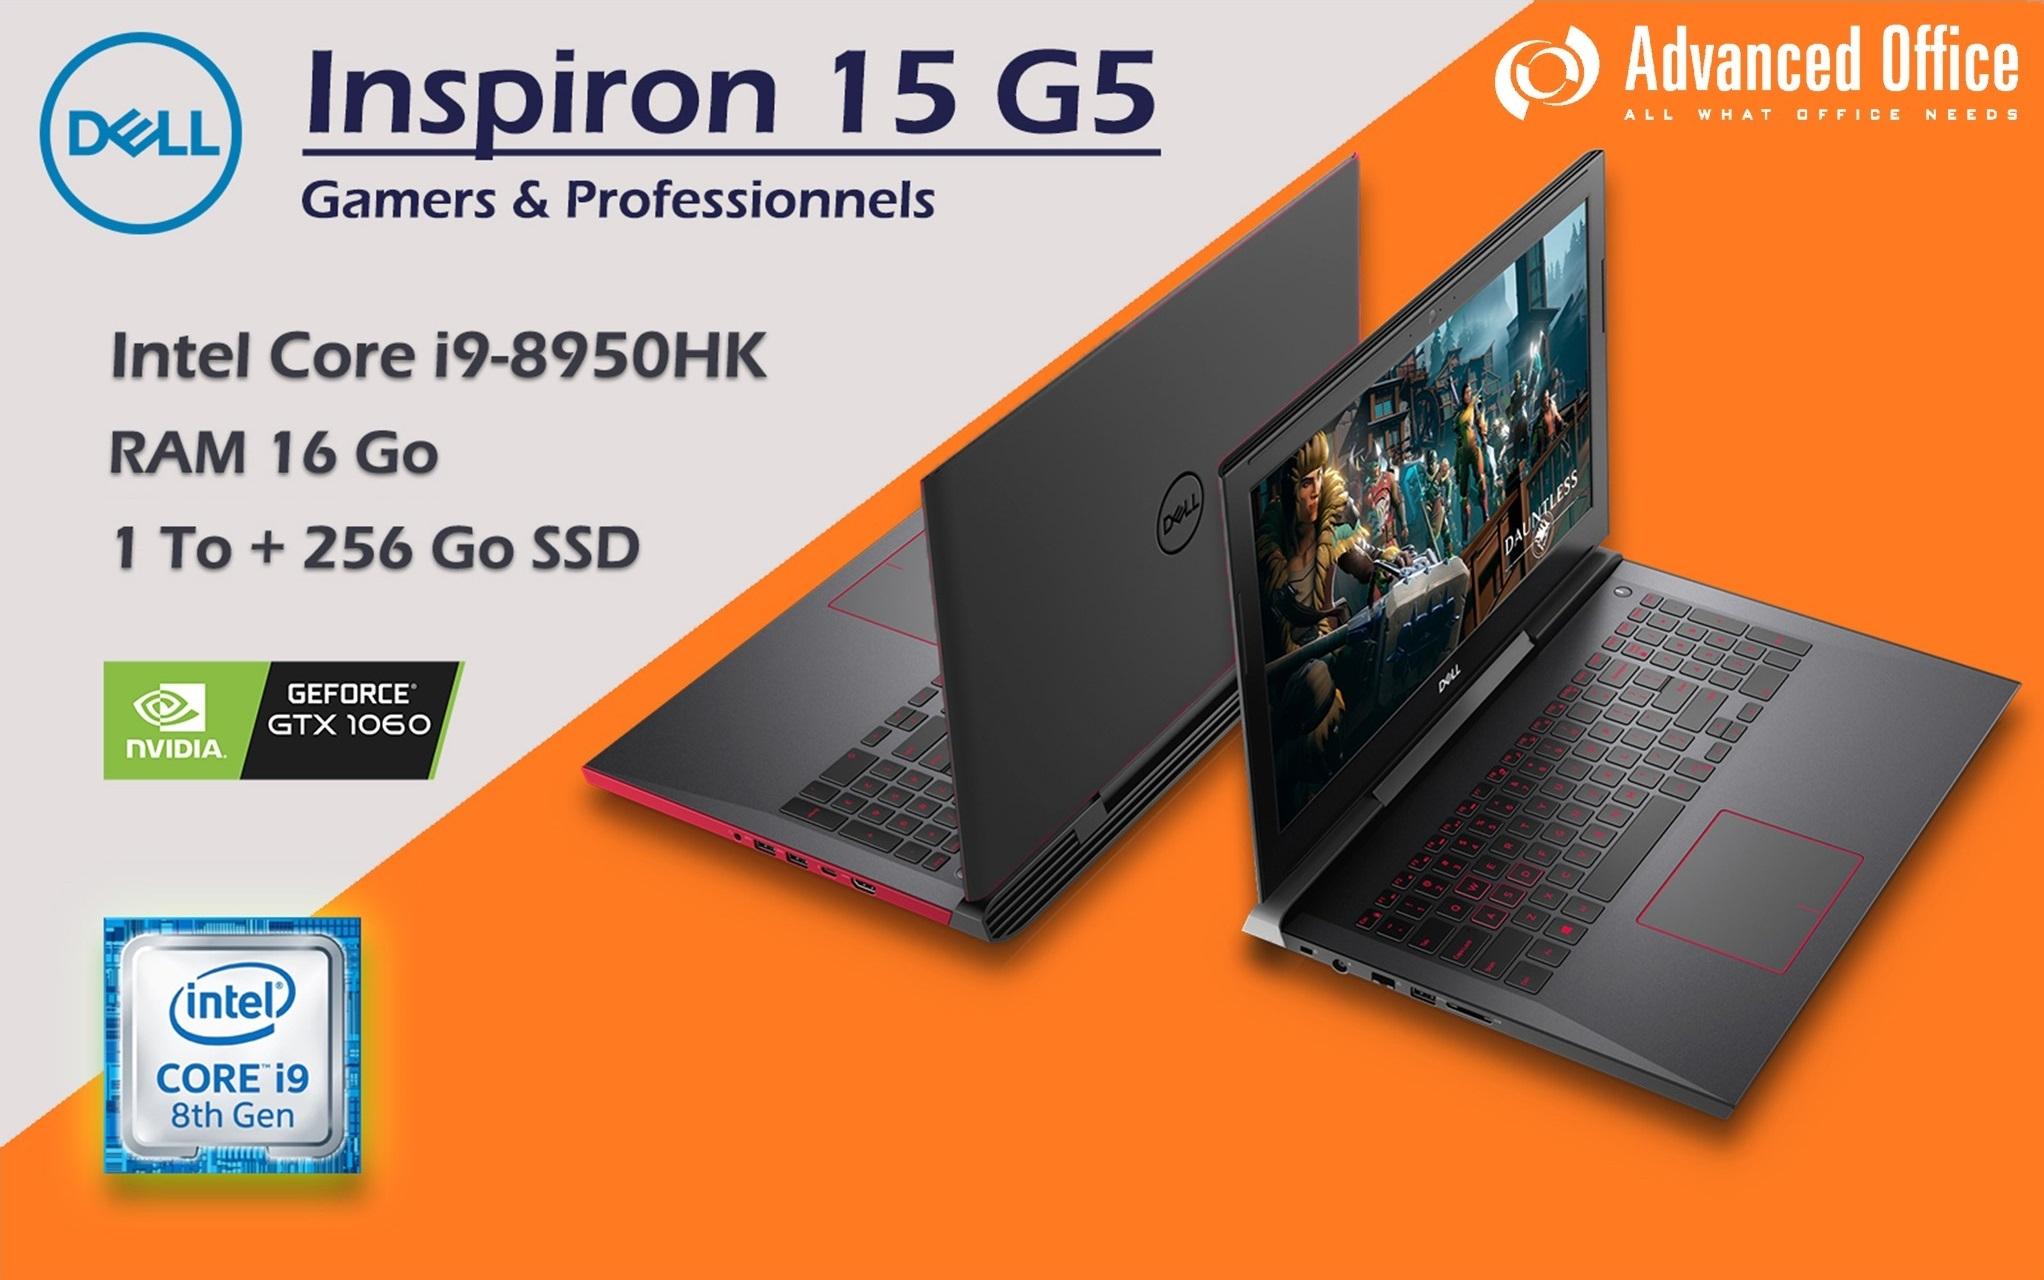 Laptop Professionnel & Gamer DELL Inspiron 15 G5 i9-8950HK, 16Go de RAM, 1To + 256Go SSD, Nvidia GeForce GTX1060